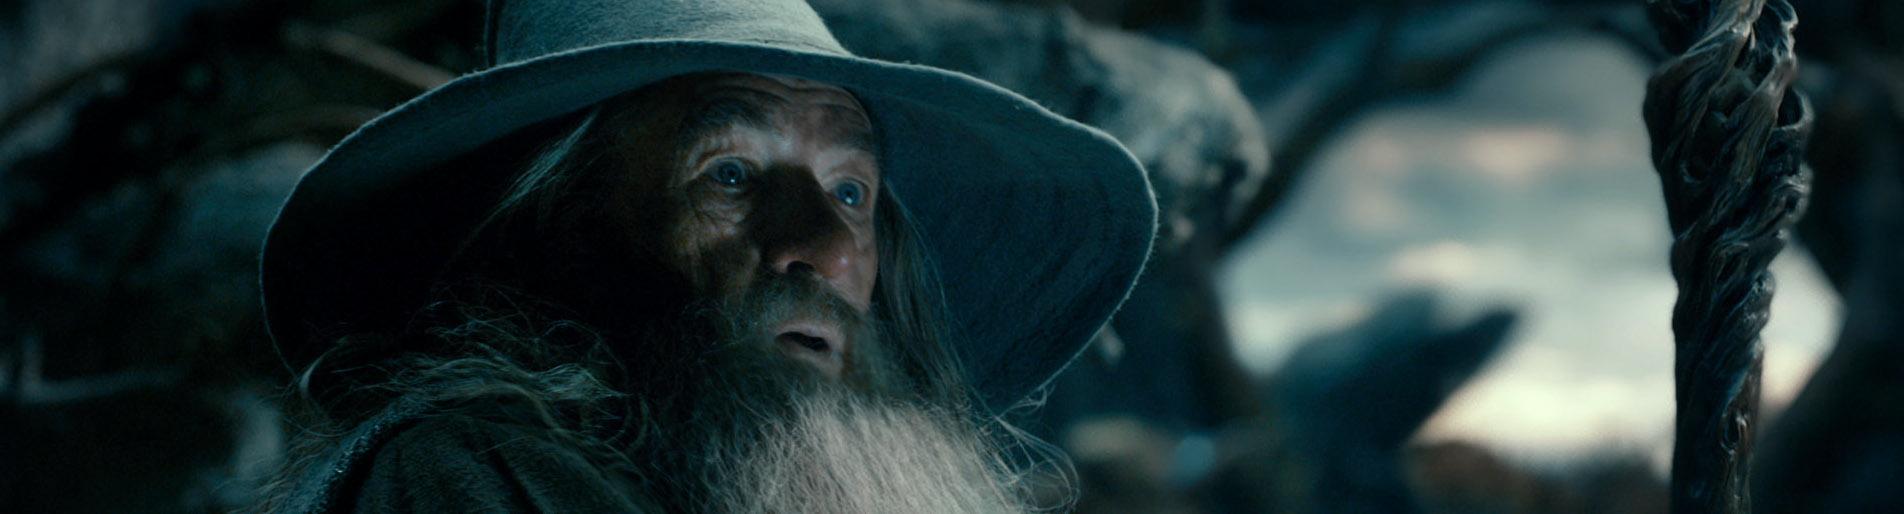 hobbit-desolation-smaug-gandalf.jpg